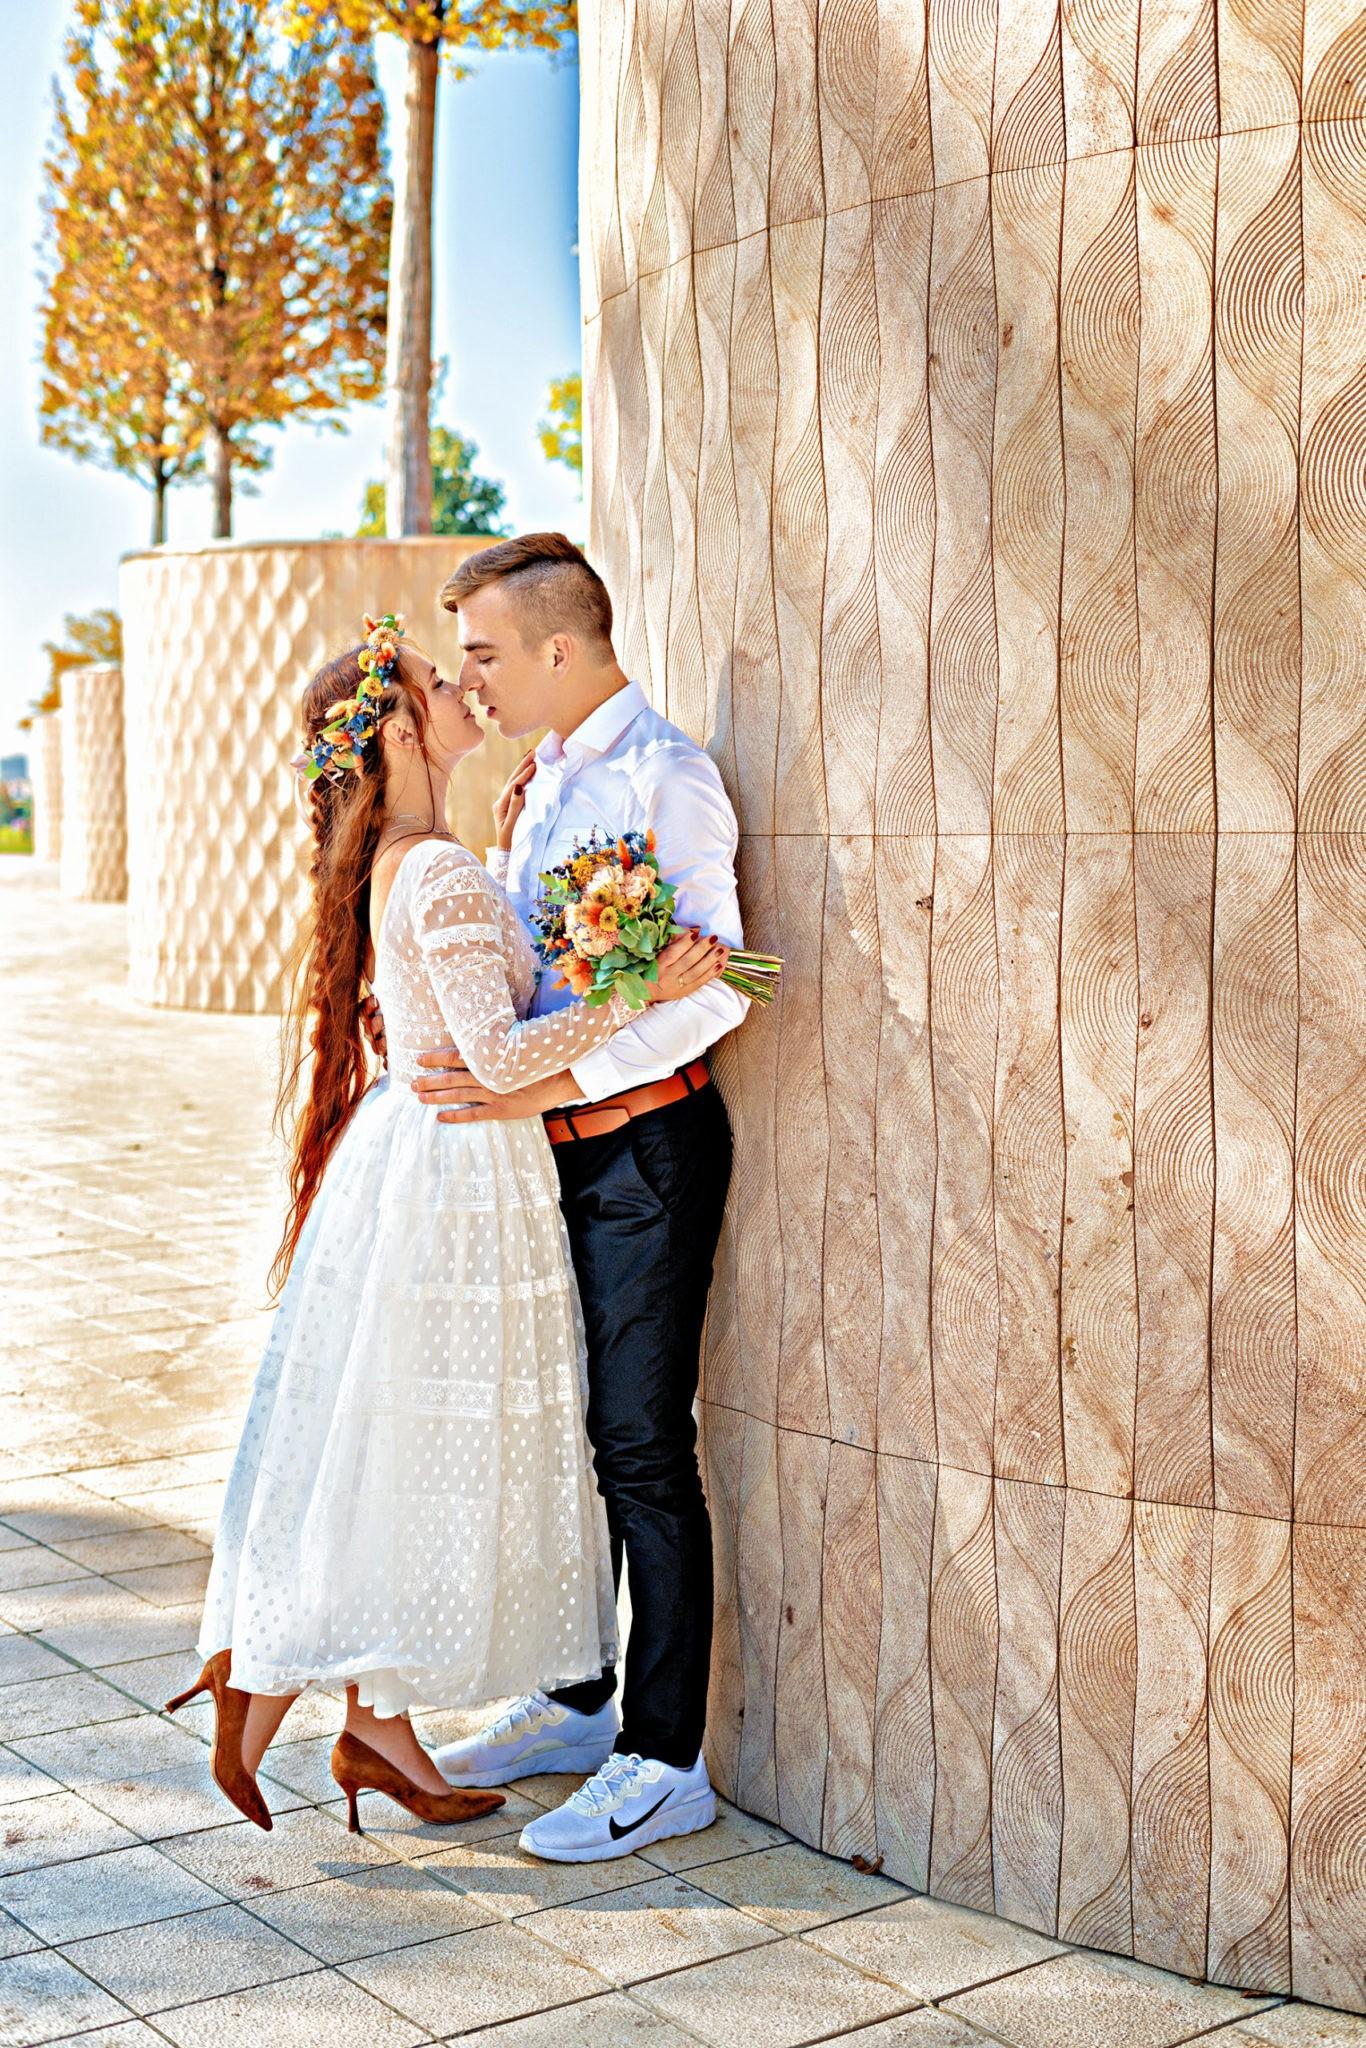 Аллея парка Галицкого, Краснодар. Свадебная съемка от Краснодарского свадебного фотографа